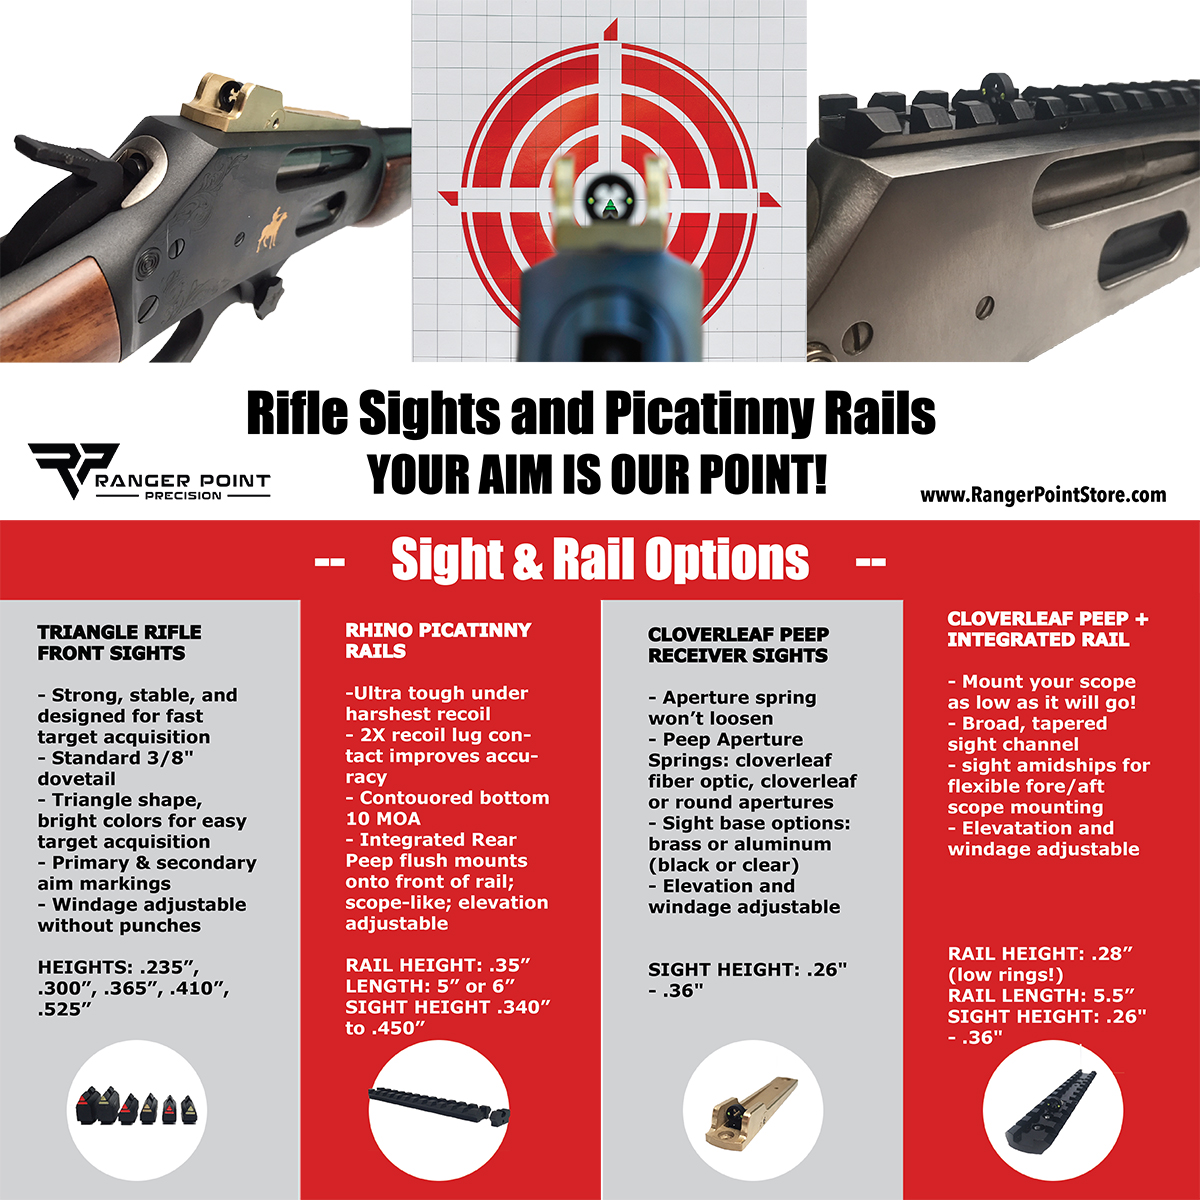 rpp-sight-options-infographic-11.18.jpg